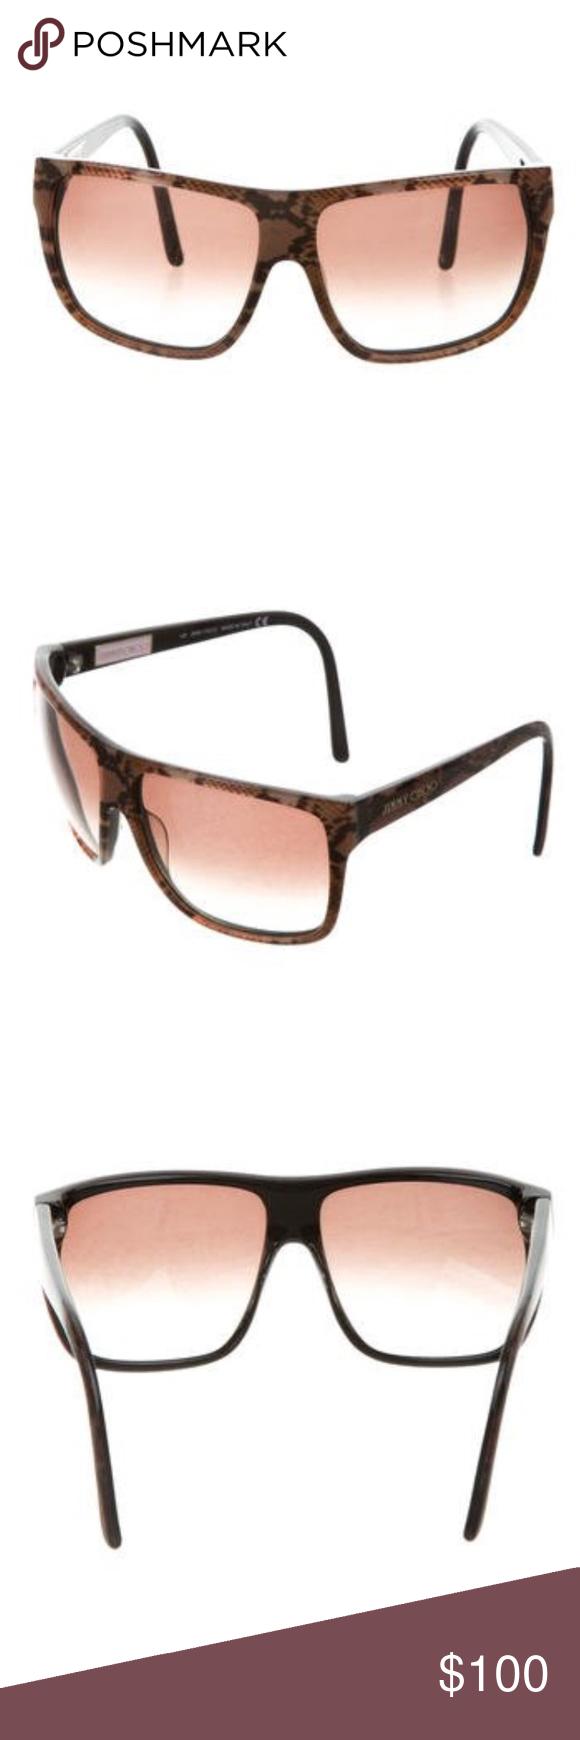 "7f5d9bf7034 Spotted while shopping on Poshmark  Jimmy Choo ""Roxanne"" Sunglasses!   poshmark  fashion  shopping  style  Jimmy Choo  Accessories"